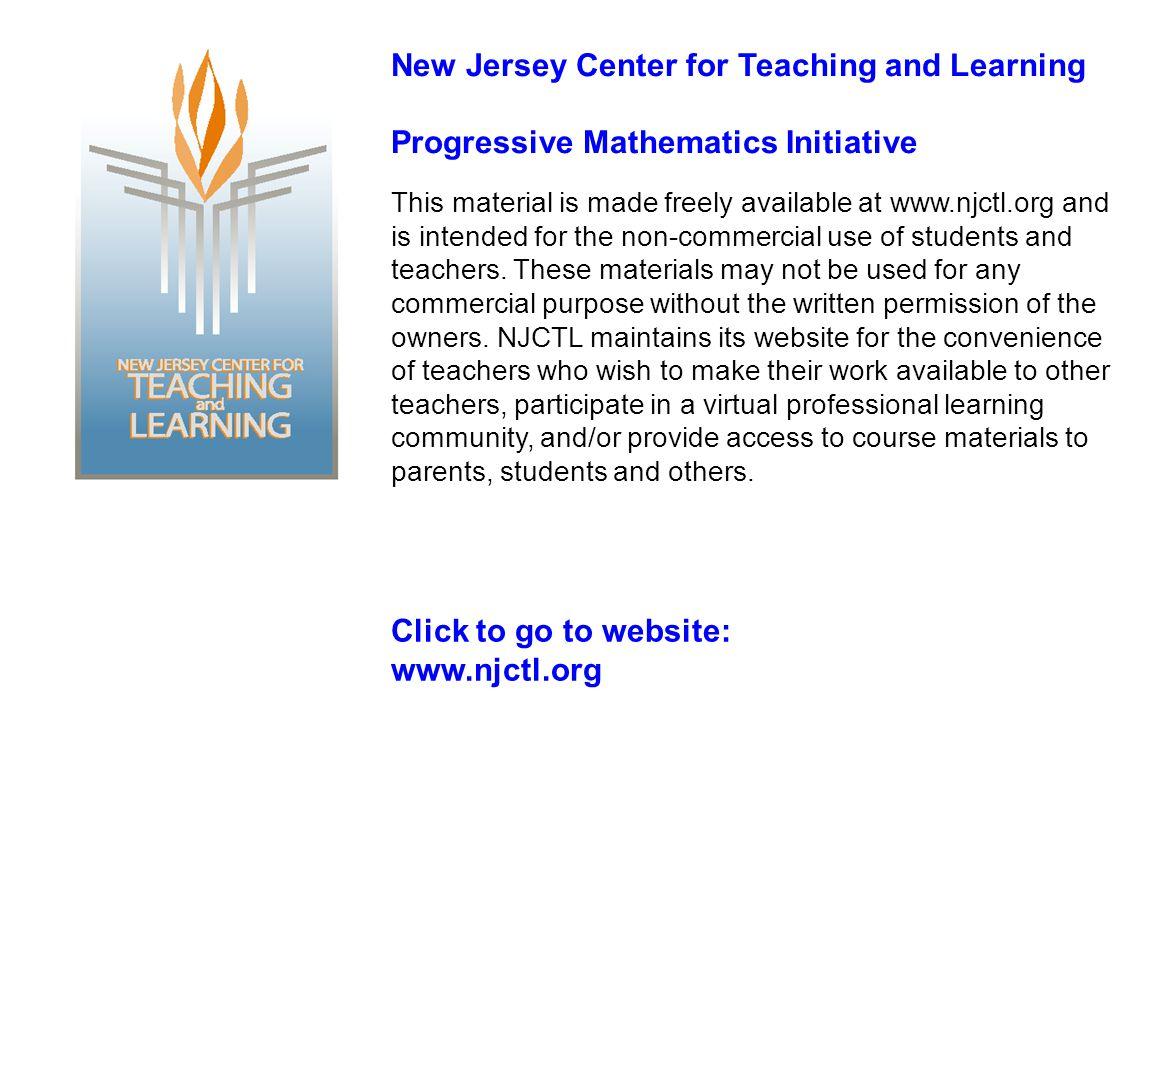 7th Grade Math Ratios & Proportions www.njctl.org 2012-08-08